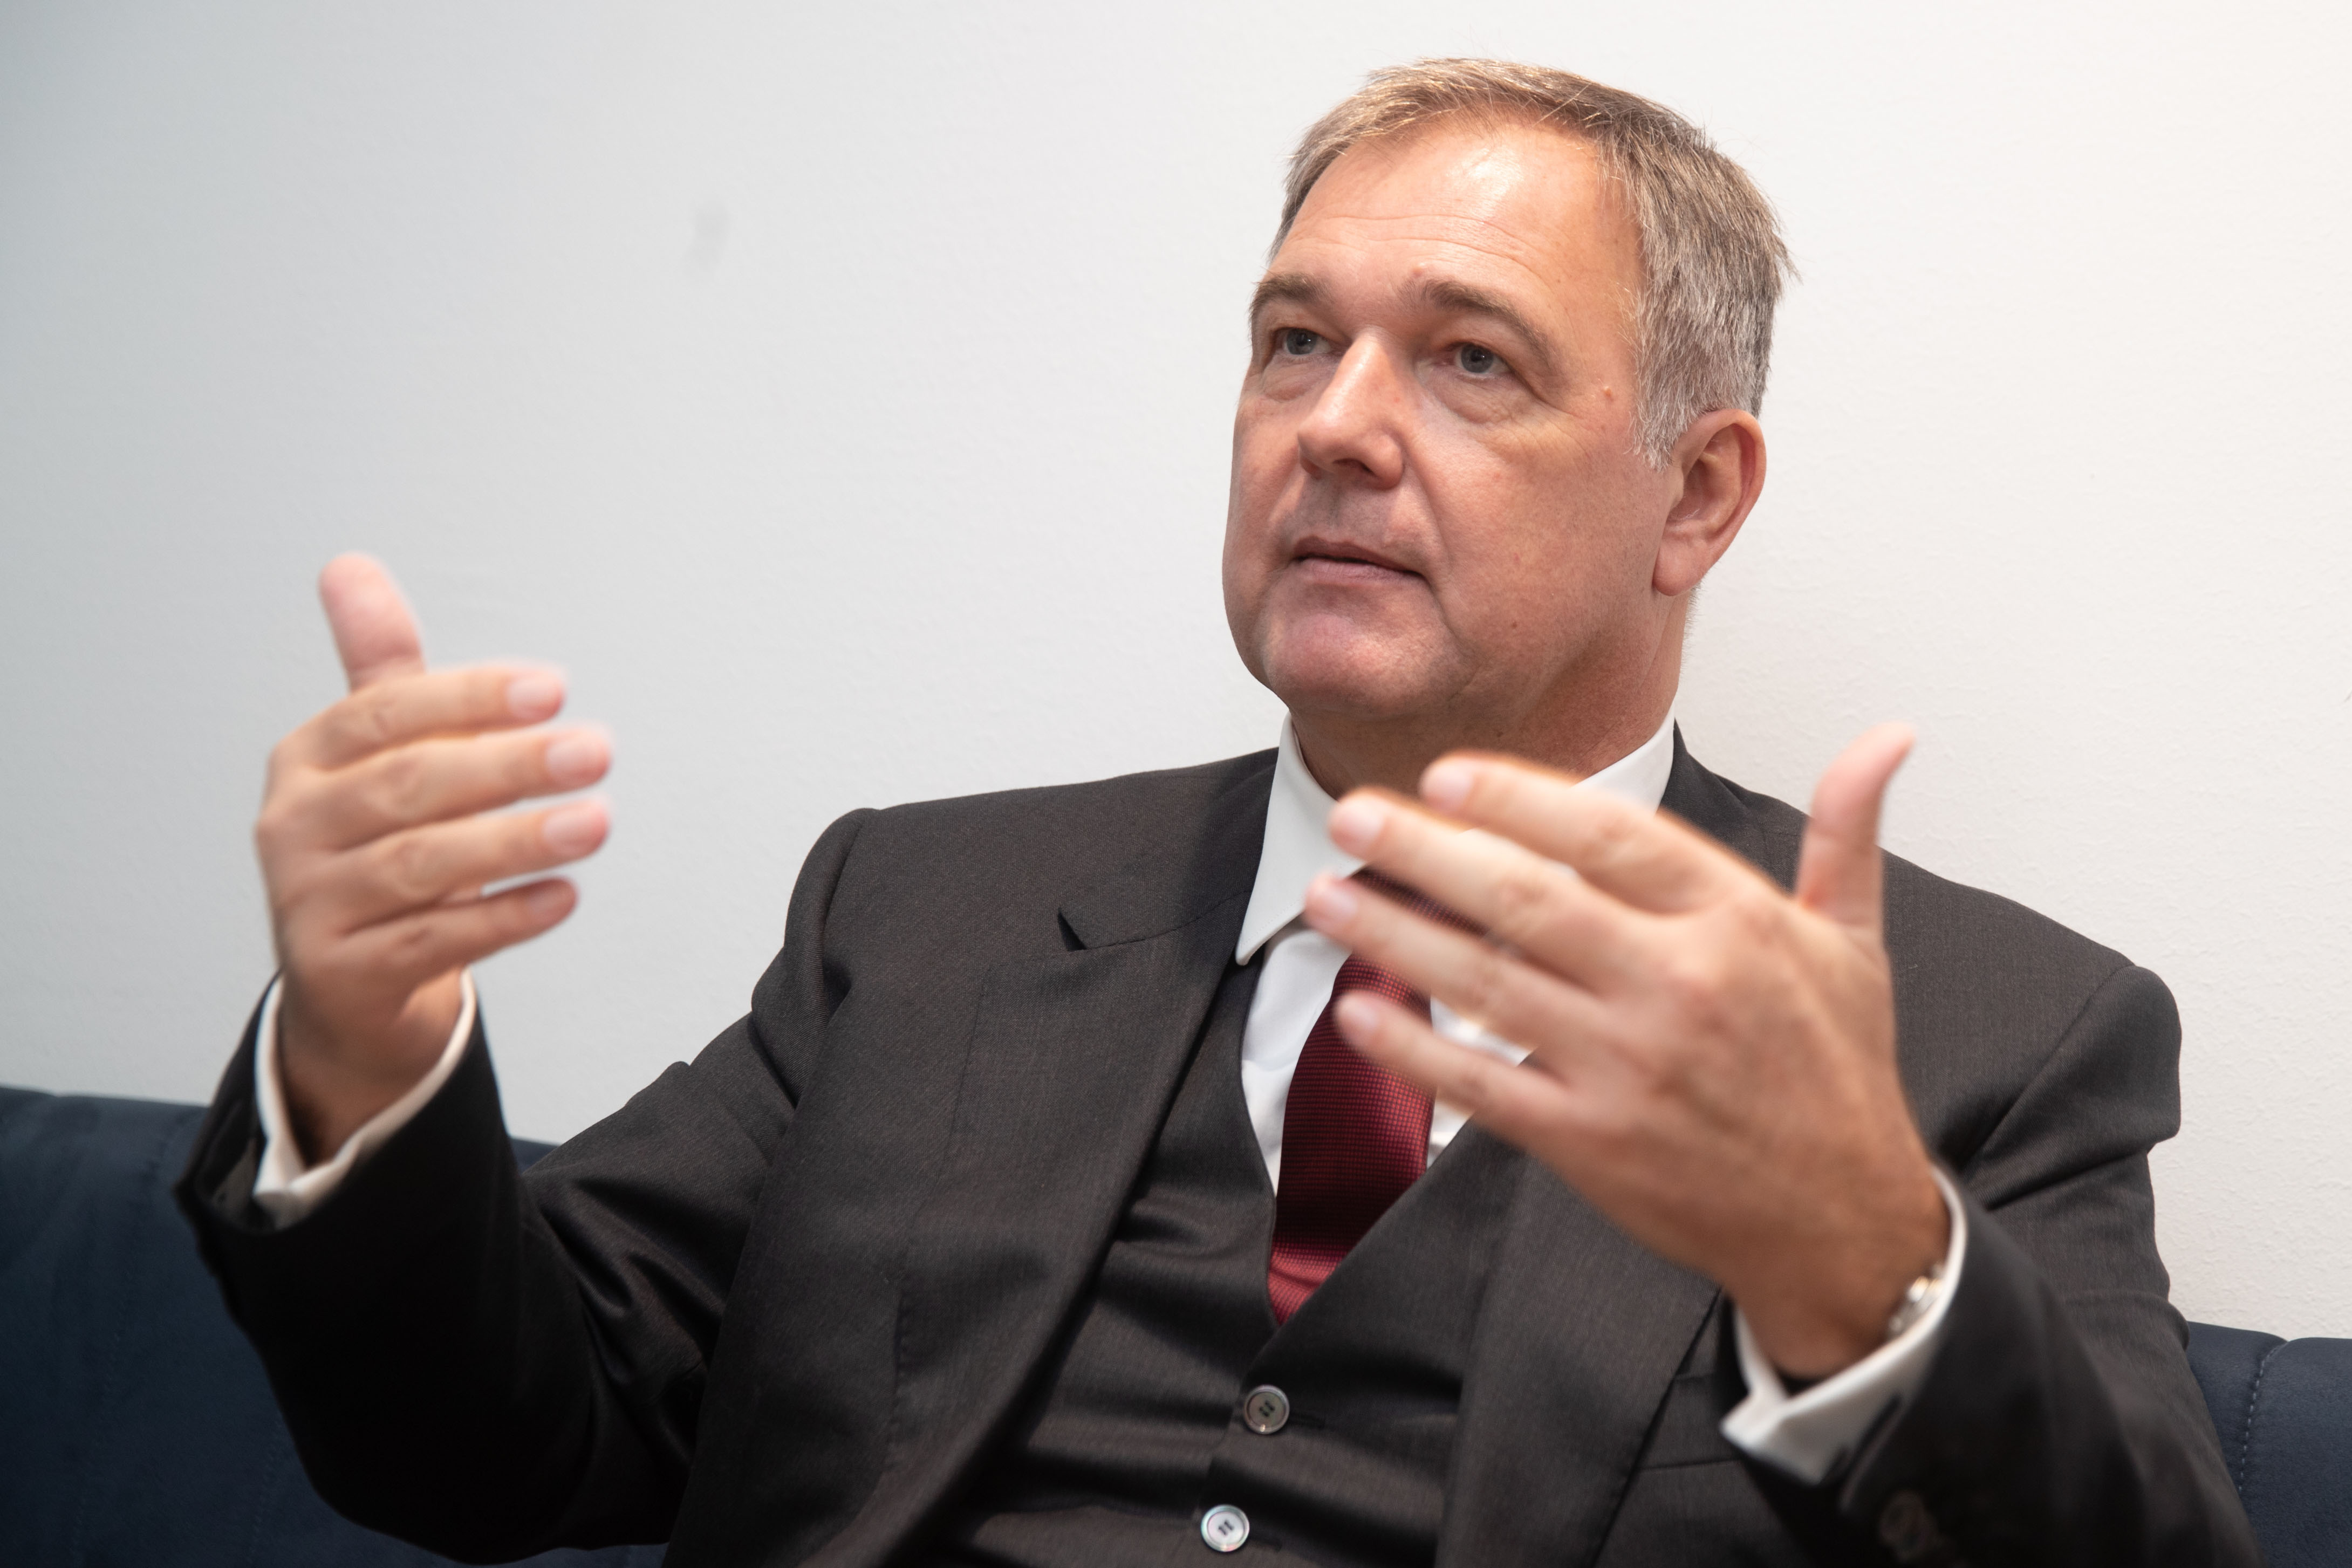 Kurier Jobinitiative Chancen 2020 -  Ausbildungsbetriebe entlasten